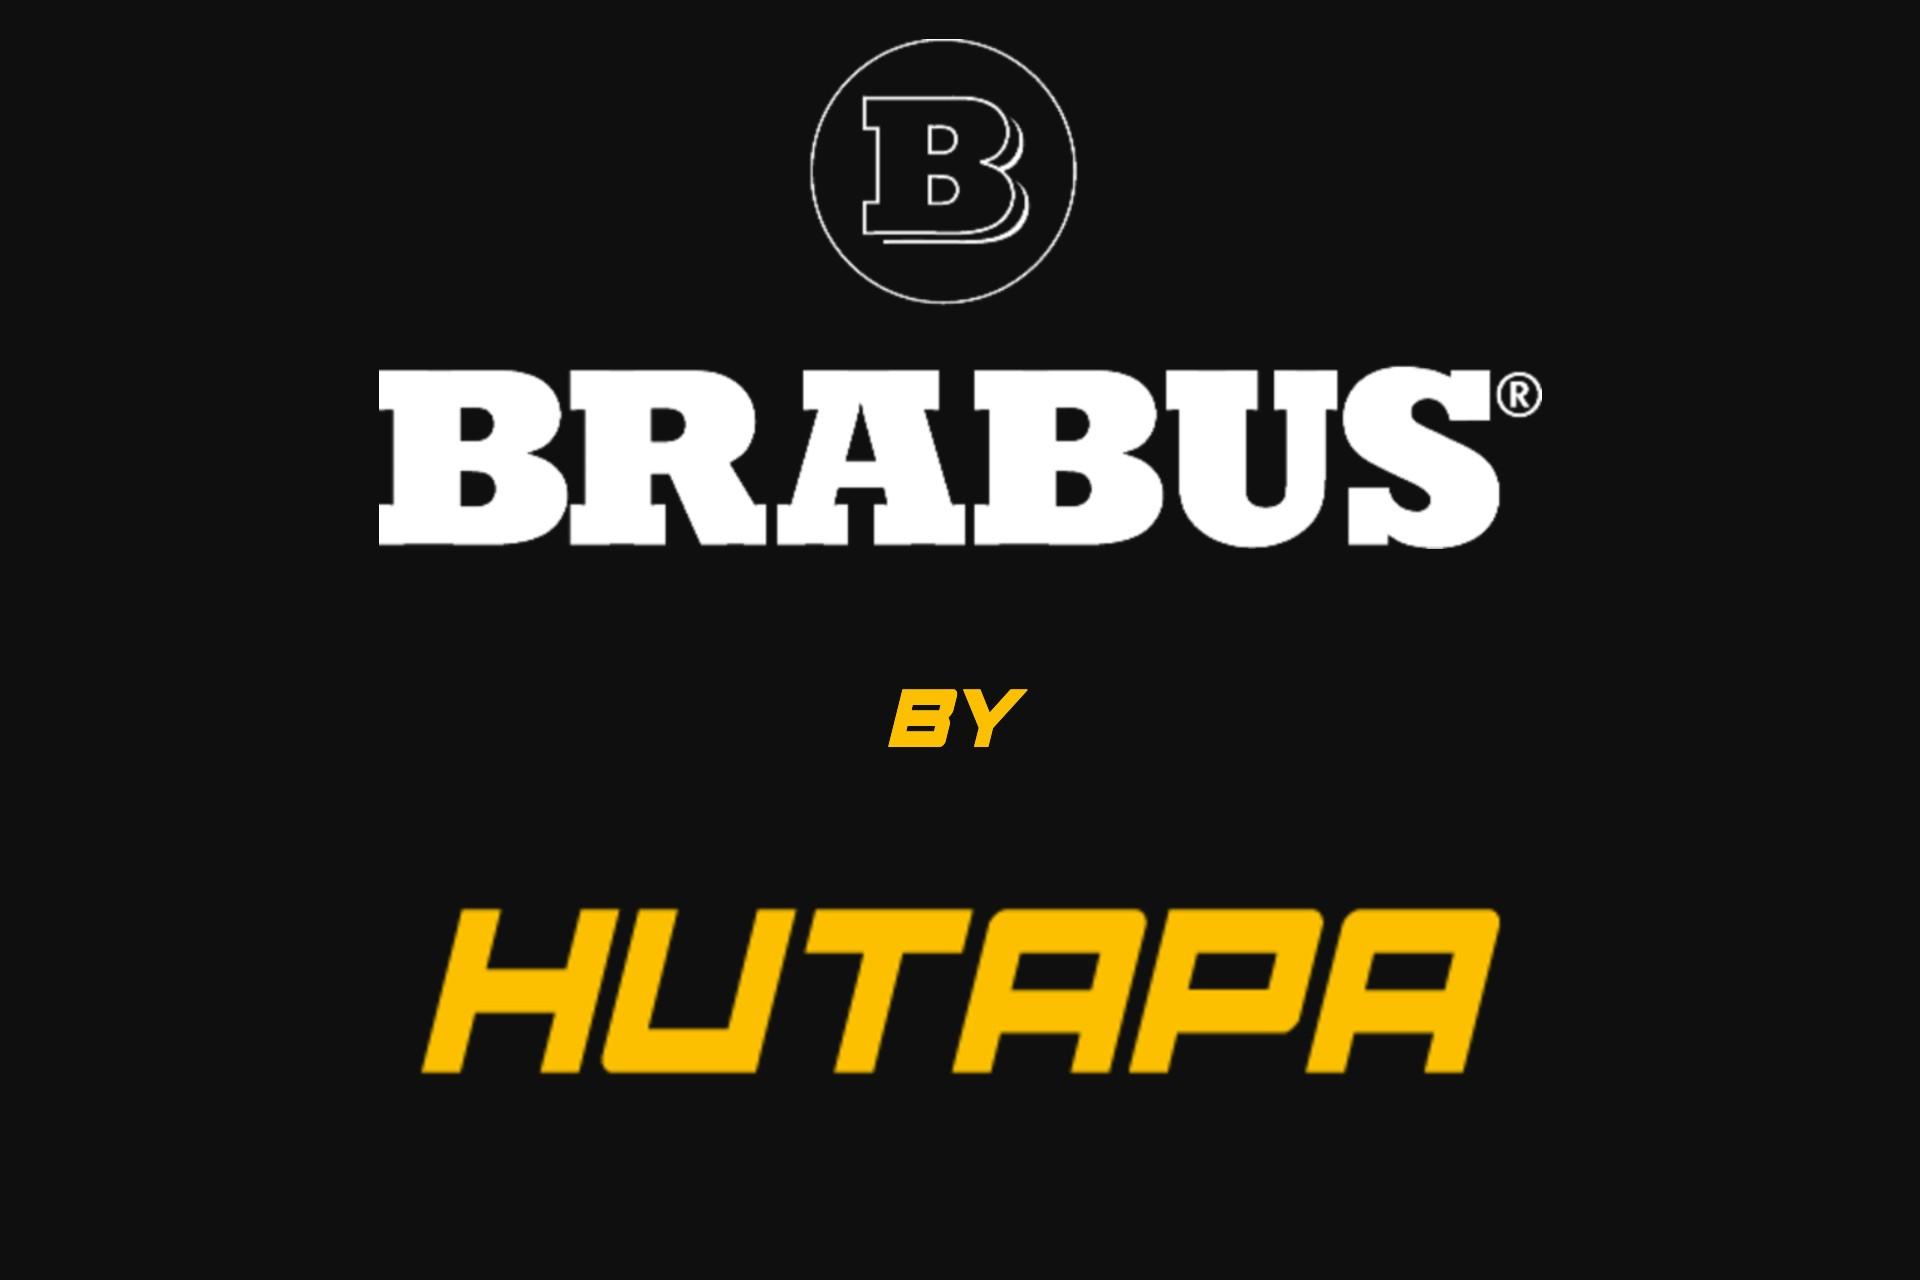 Brabus Dealer | Autogarage Hutapa